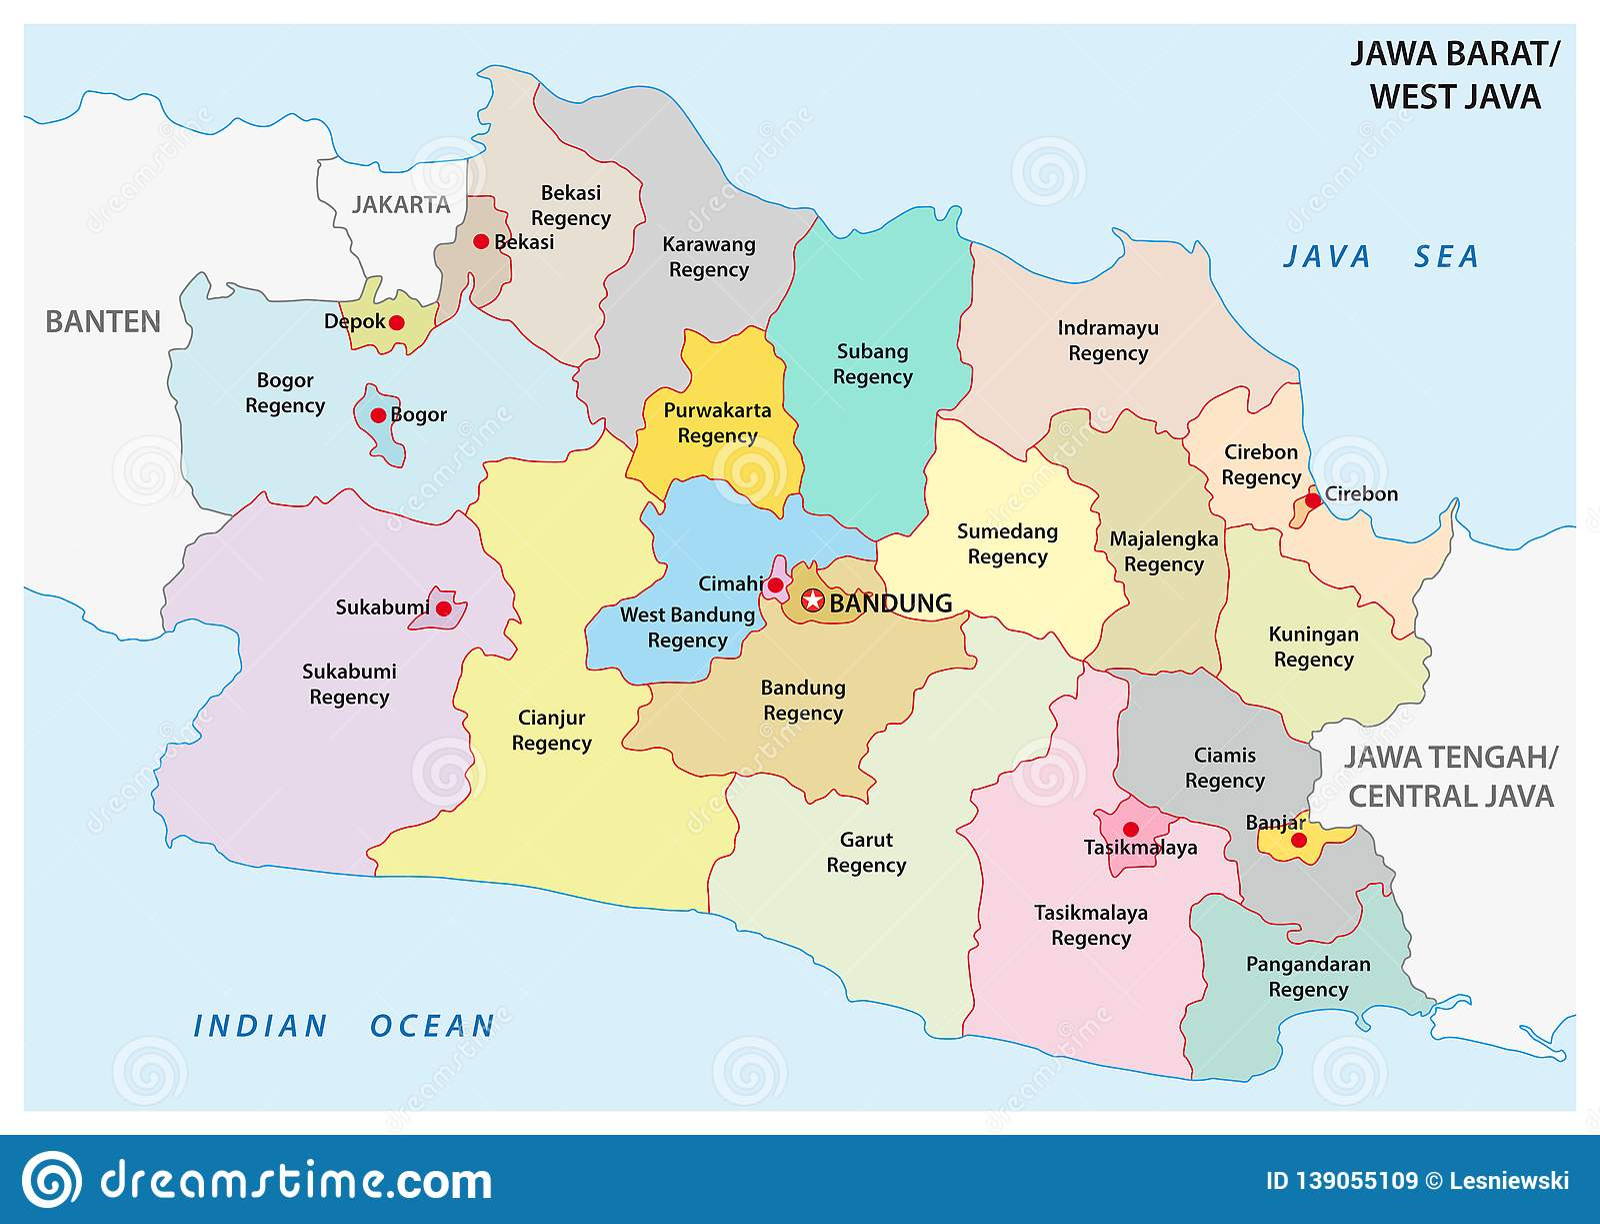 Jawa Barat West Java Administrative And Political Vector